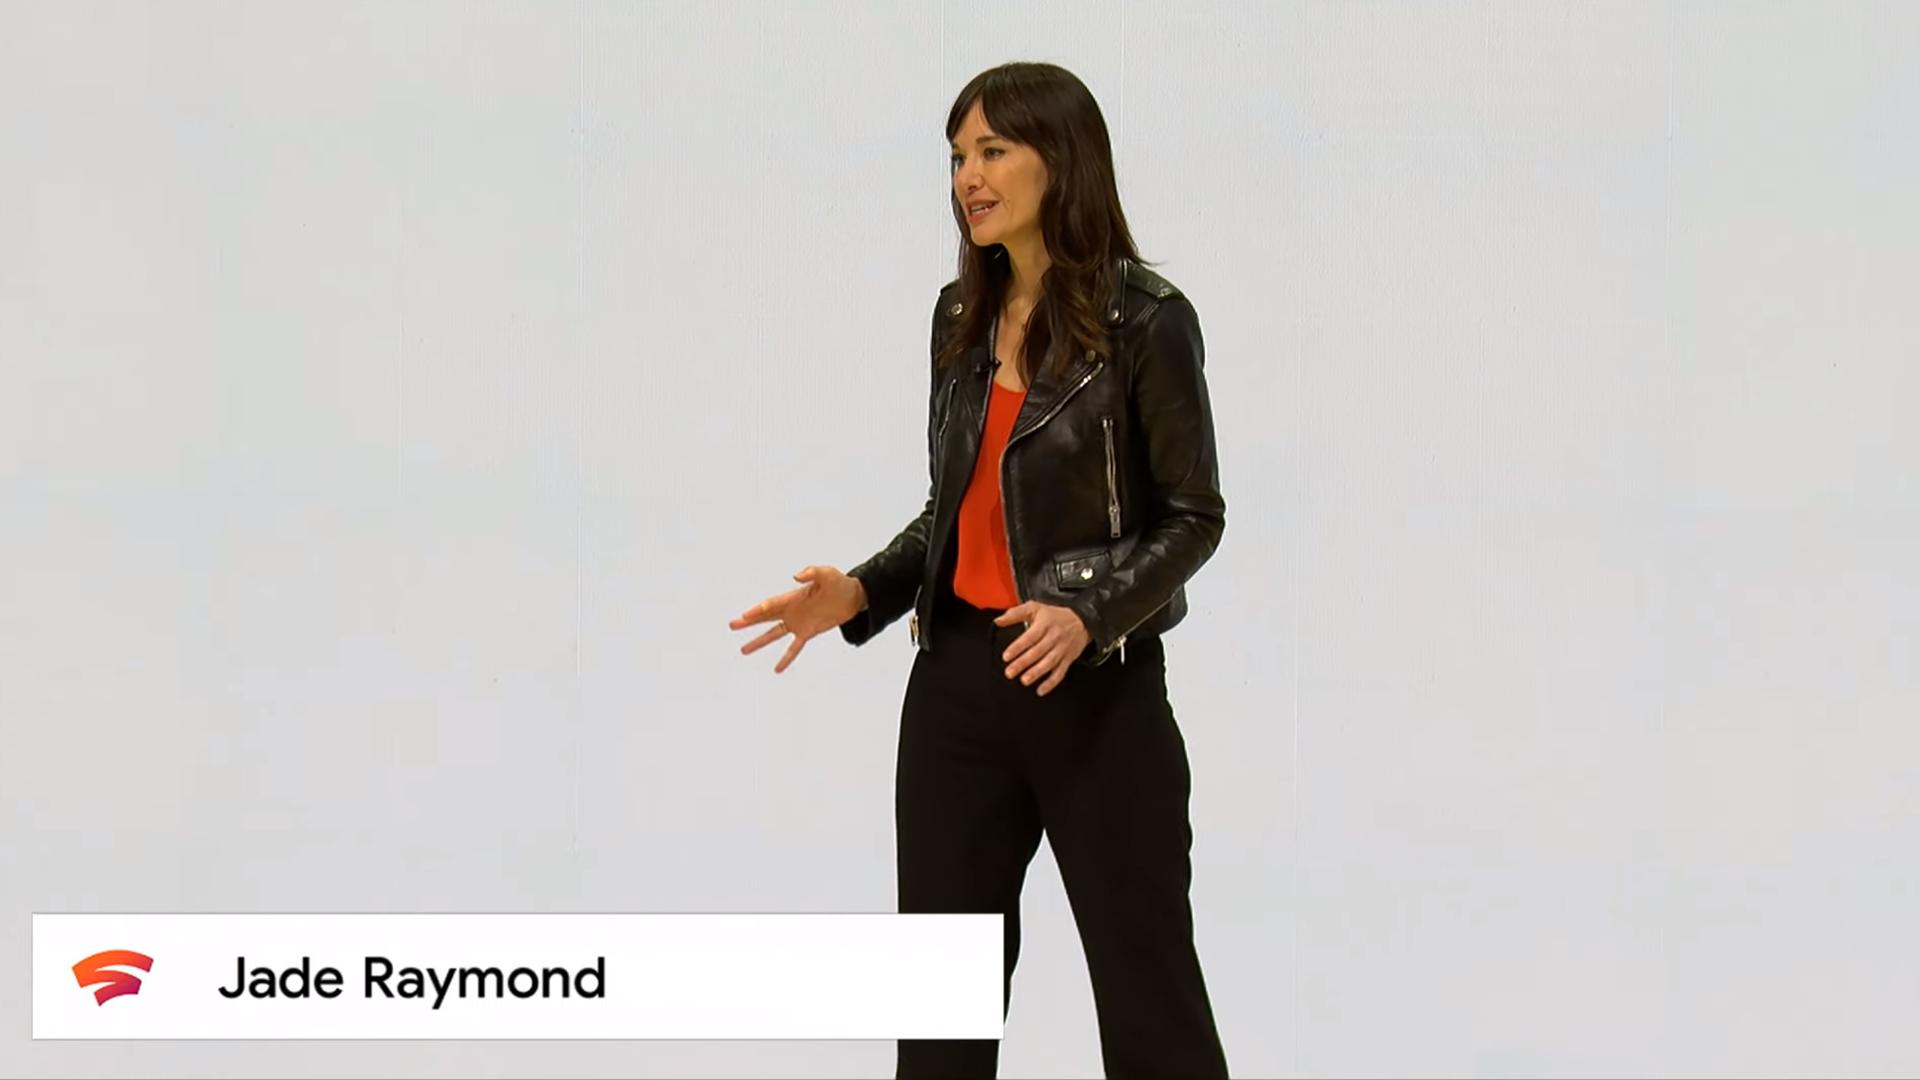 Google's Stadia studio, under Ubisoft and EA veteran Raymond, will woo developers.